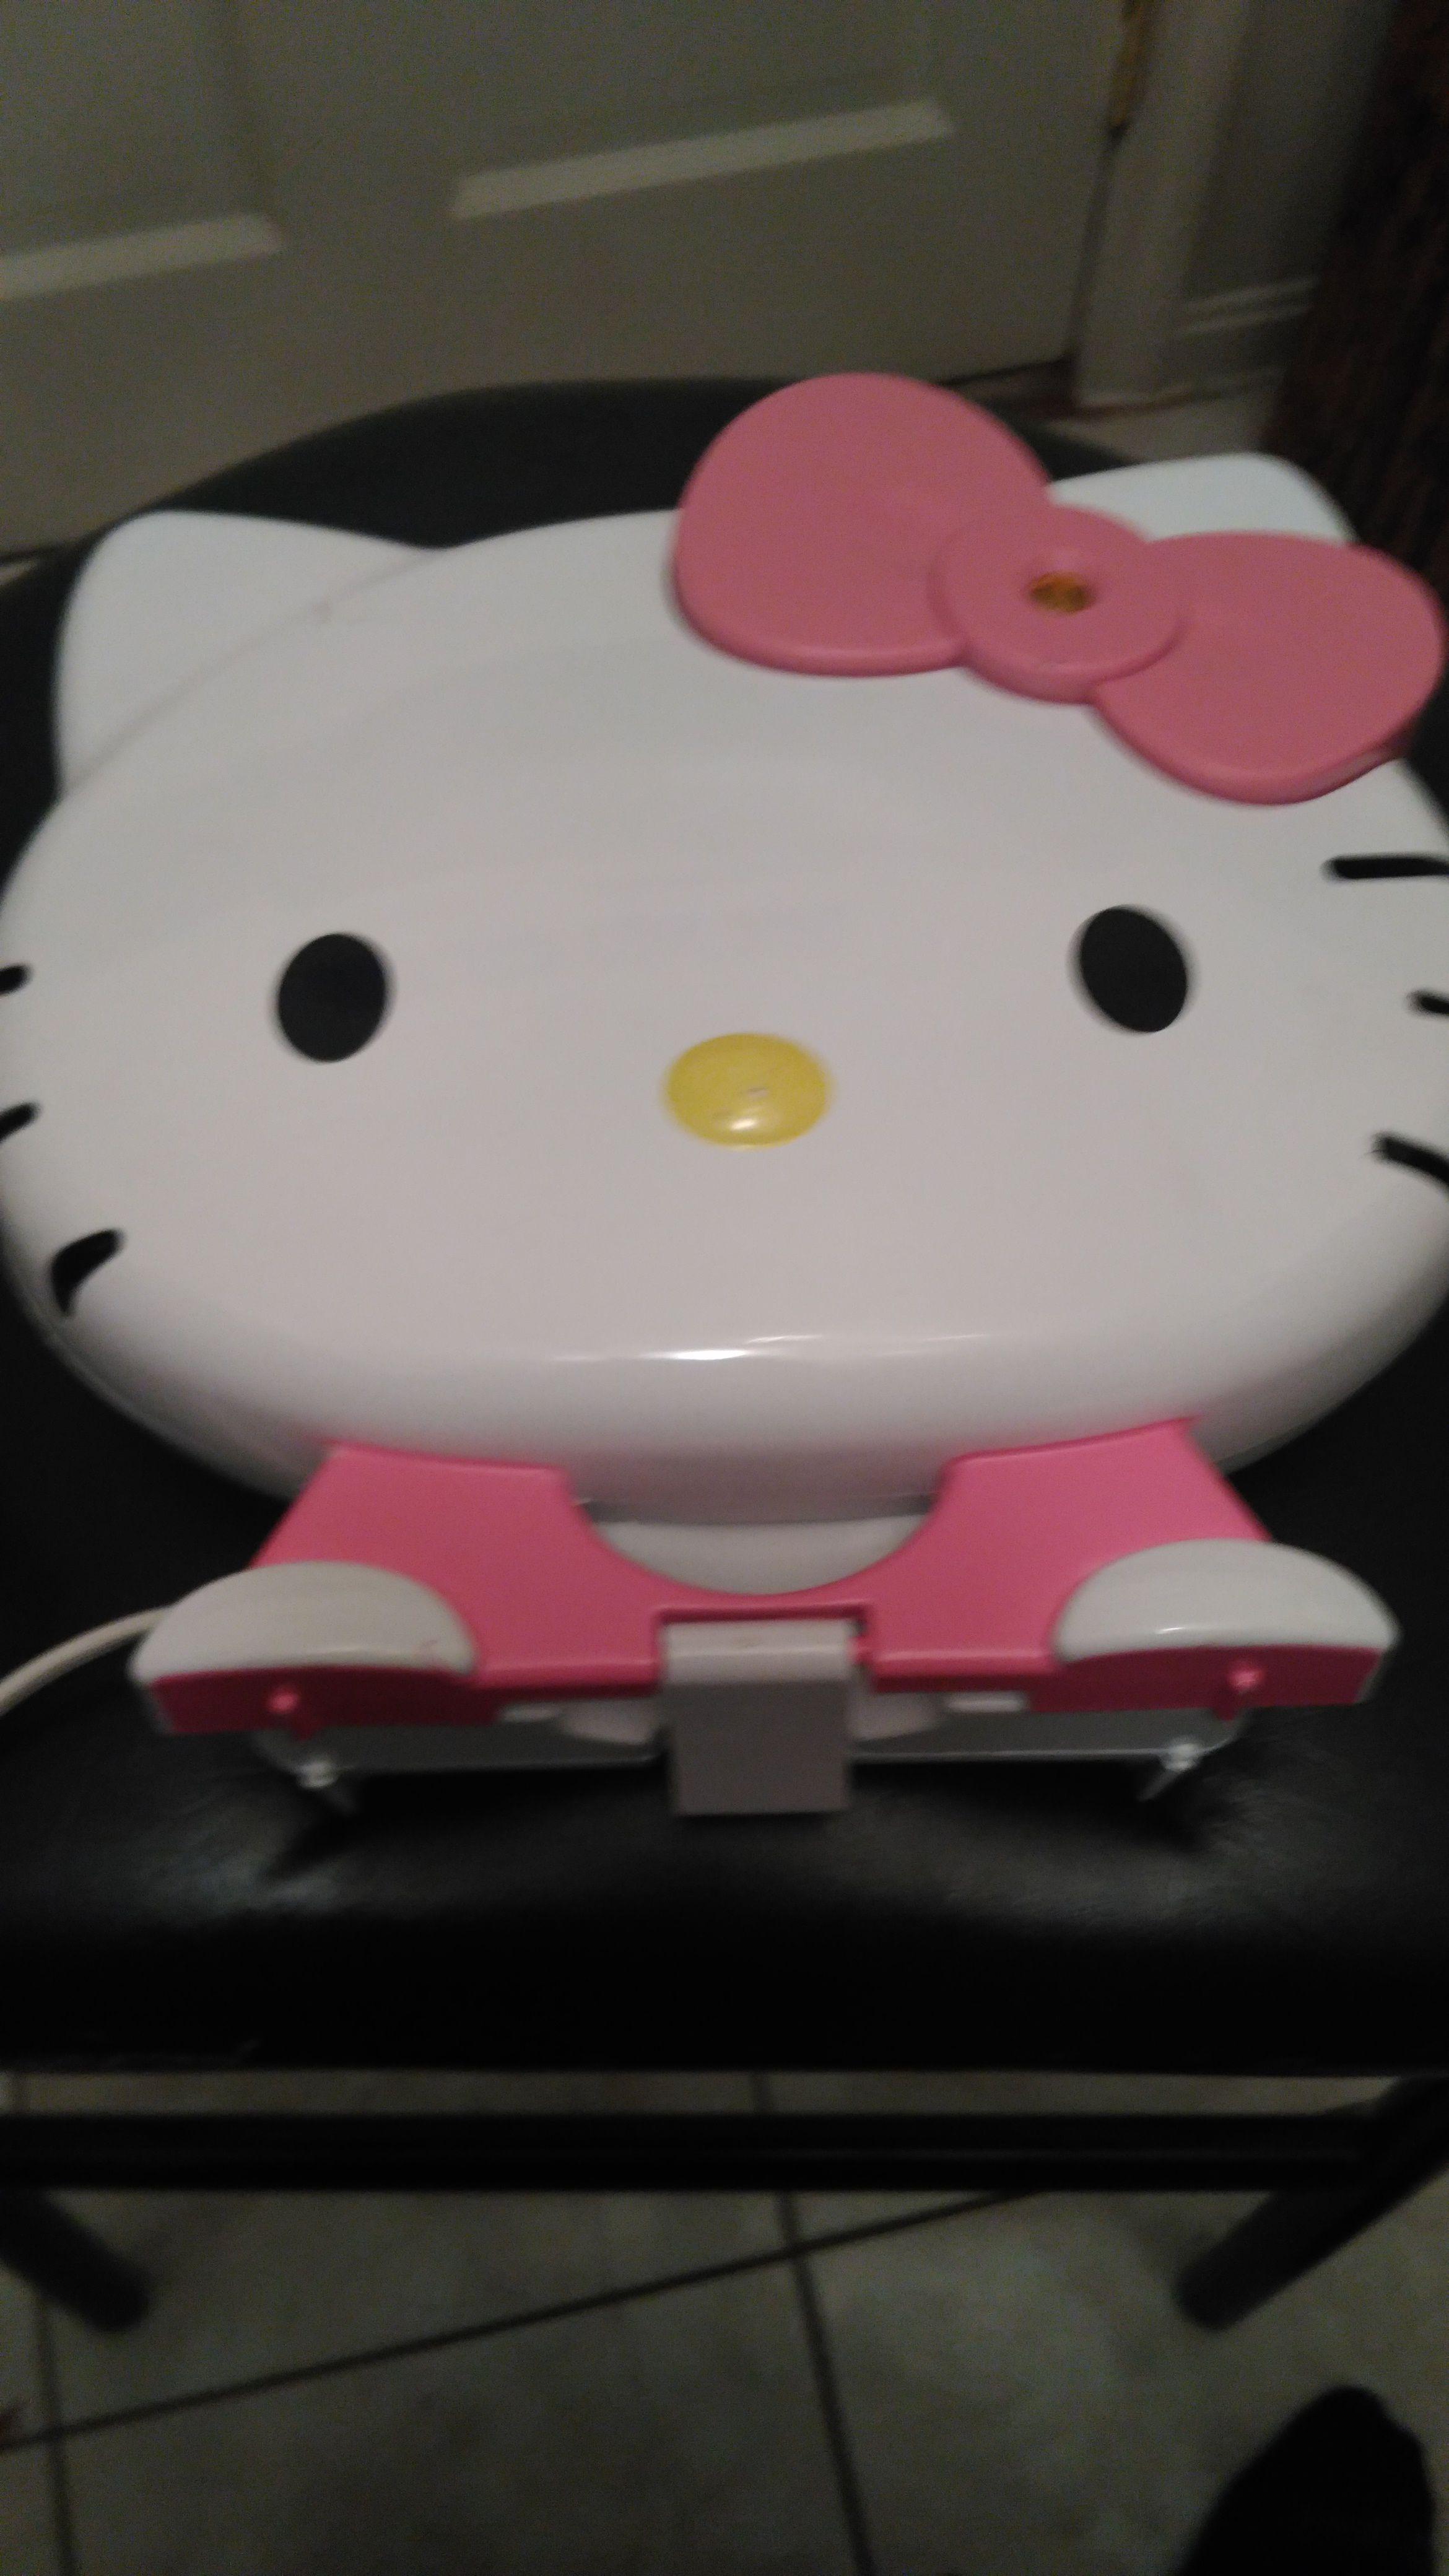 HELLO KITTY Pancake MAKER### FREE HELLO KITTY PLUSH ANIMAL++++